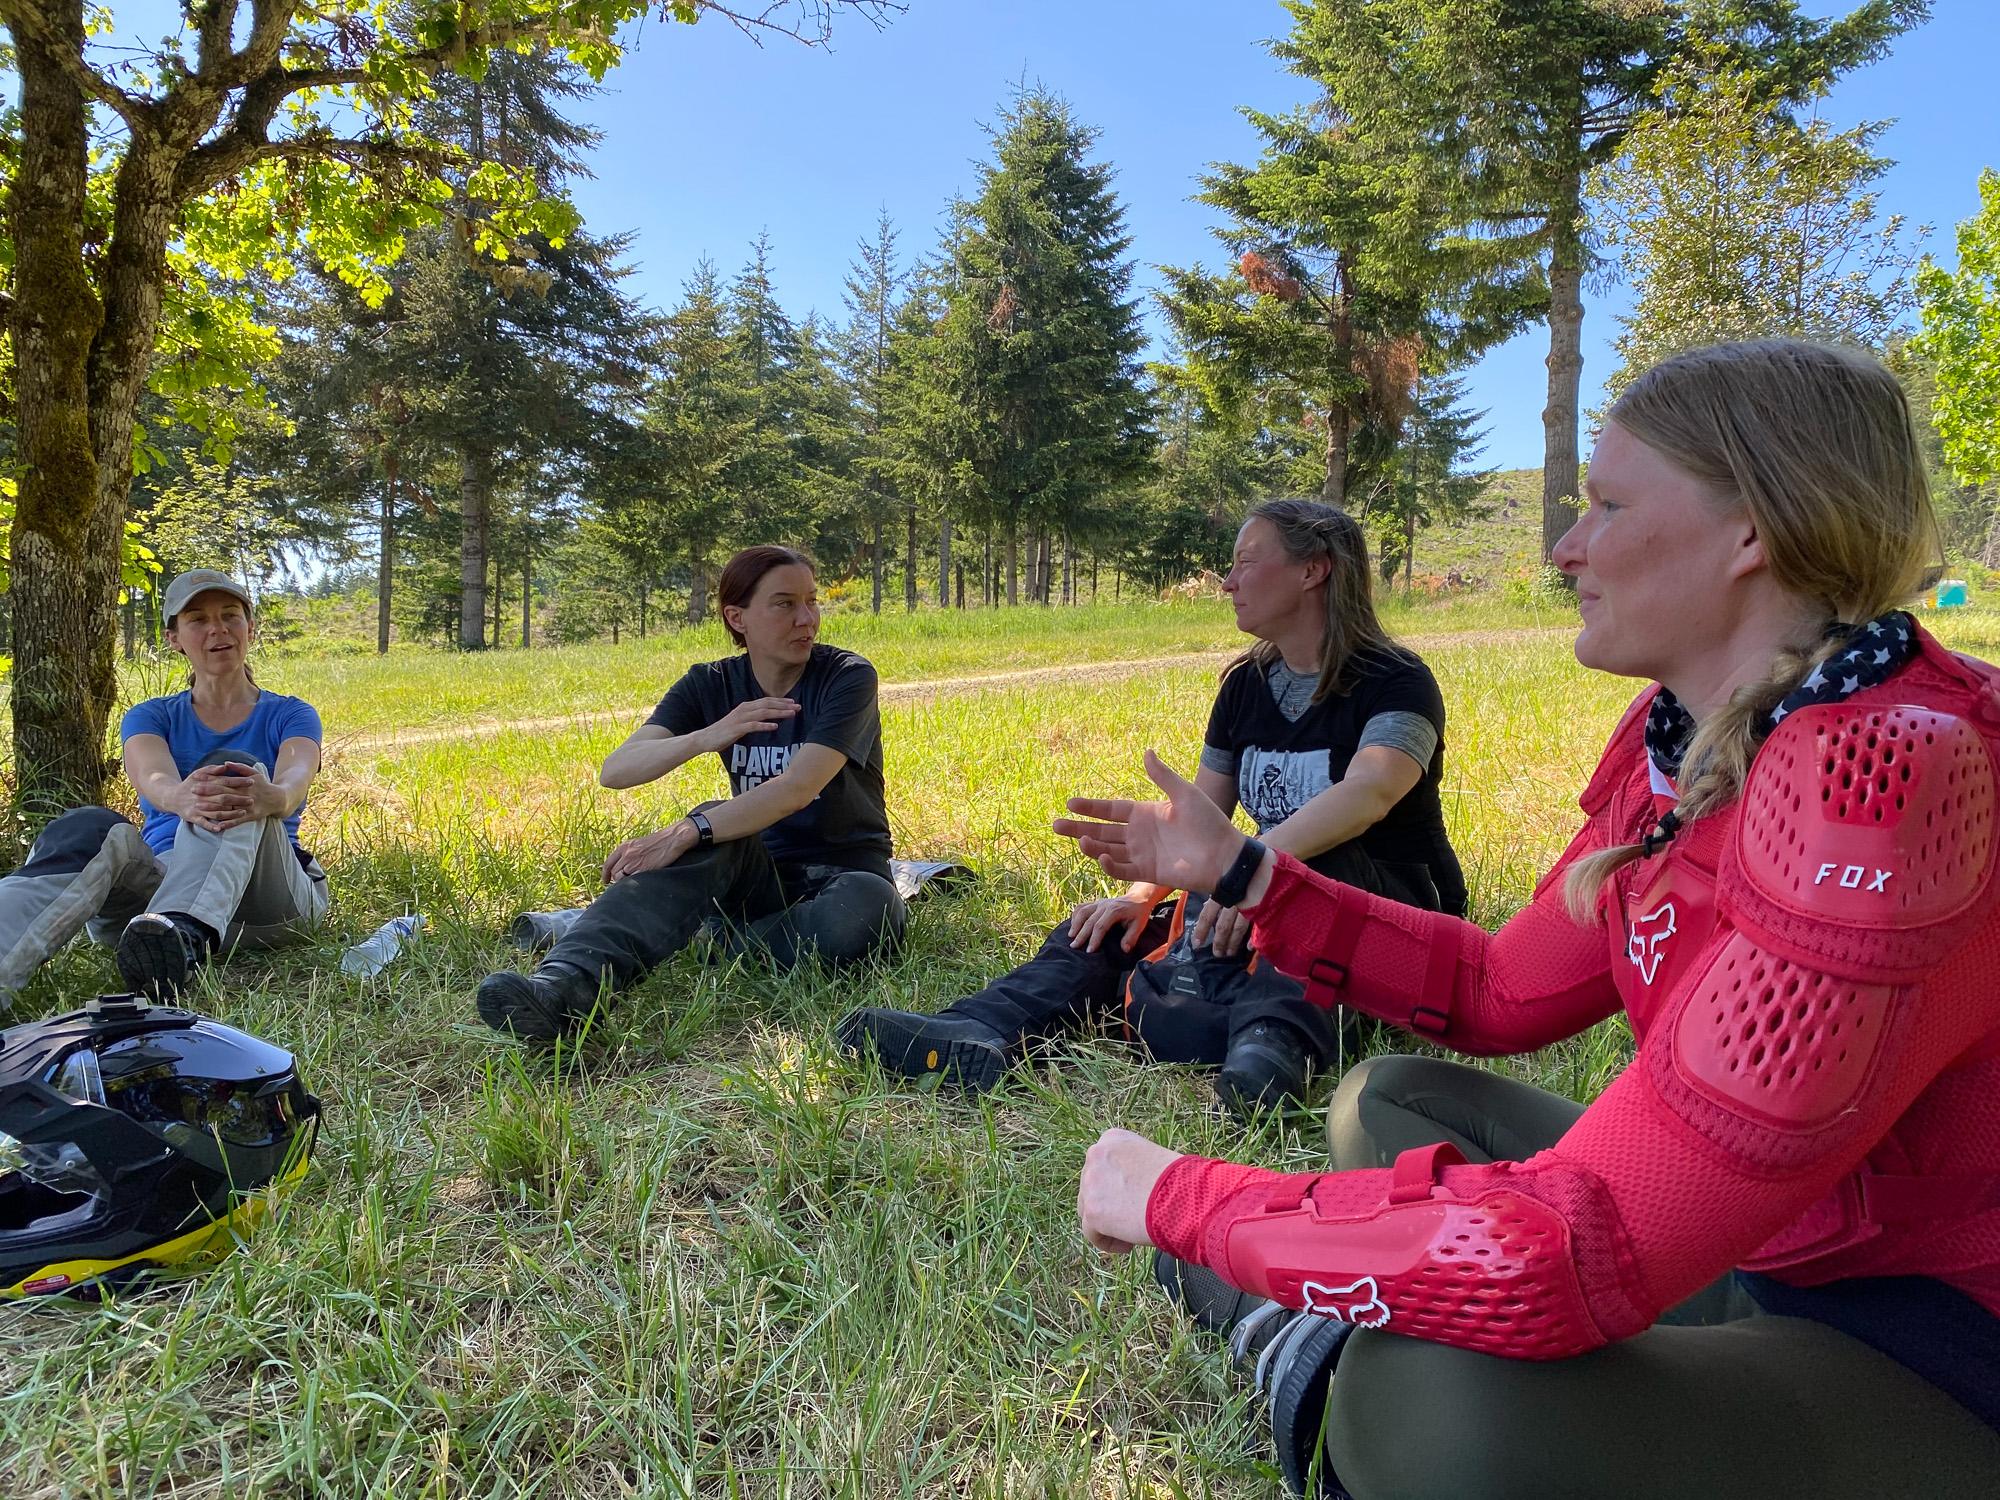 sheADV moto training course level 1/2 meeting people